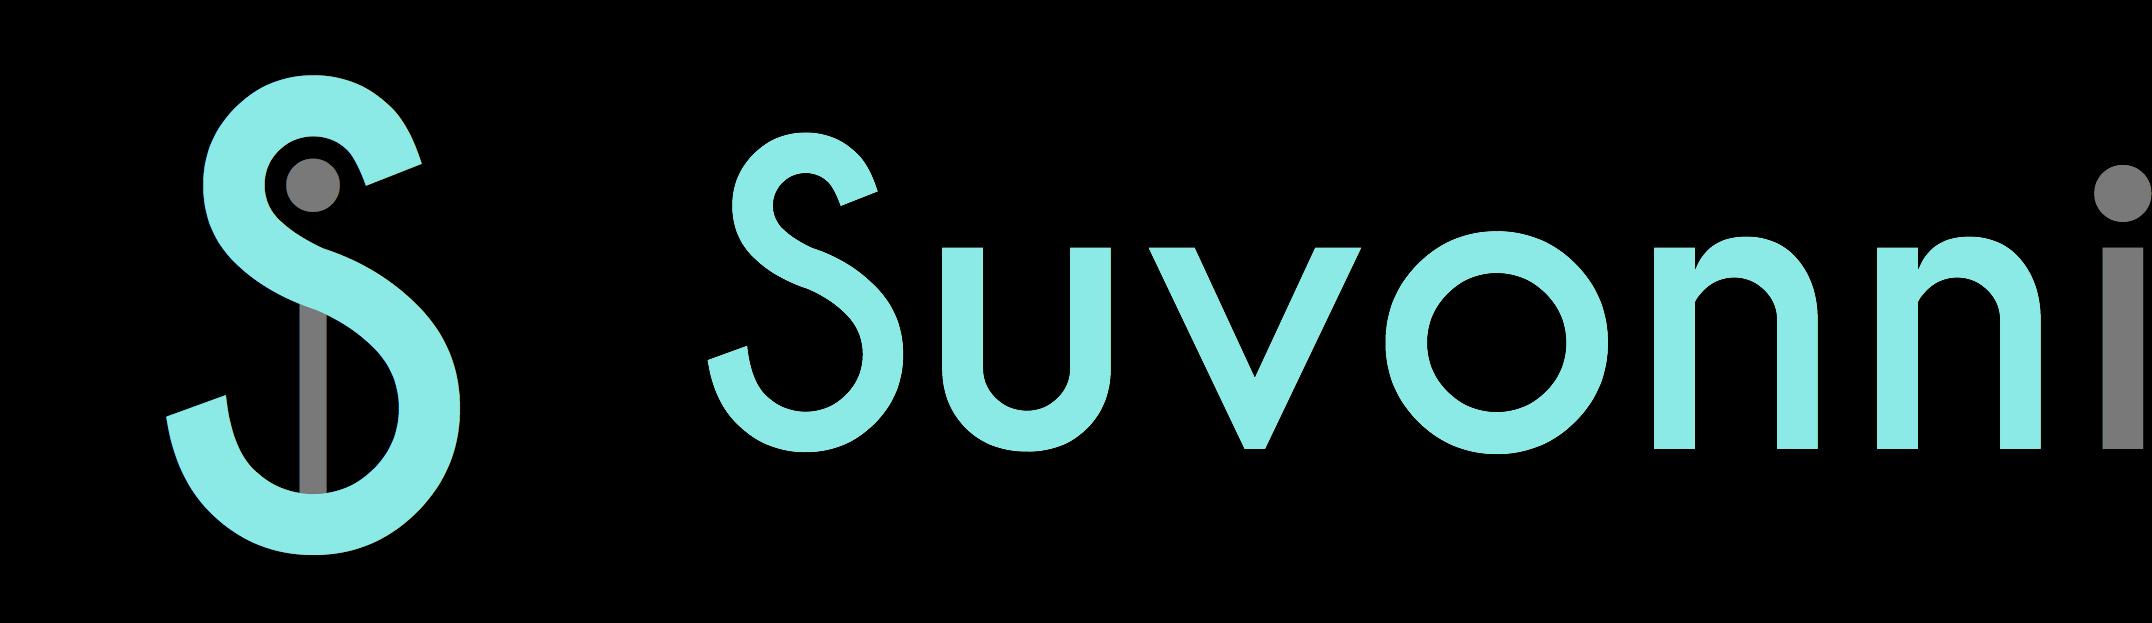 About Suvonni